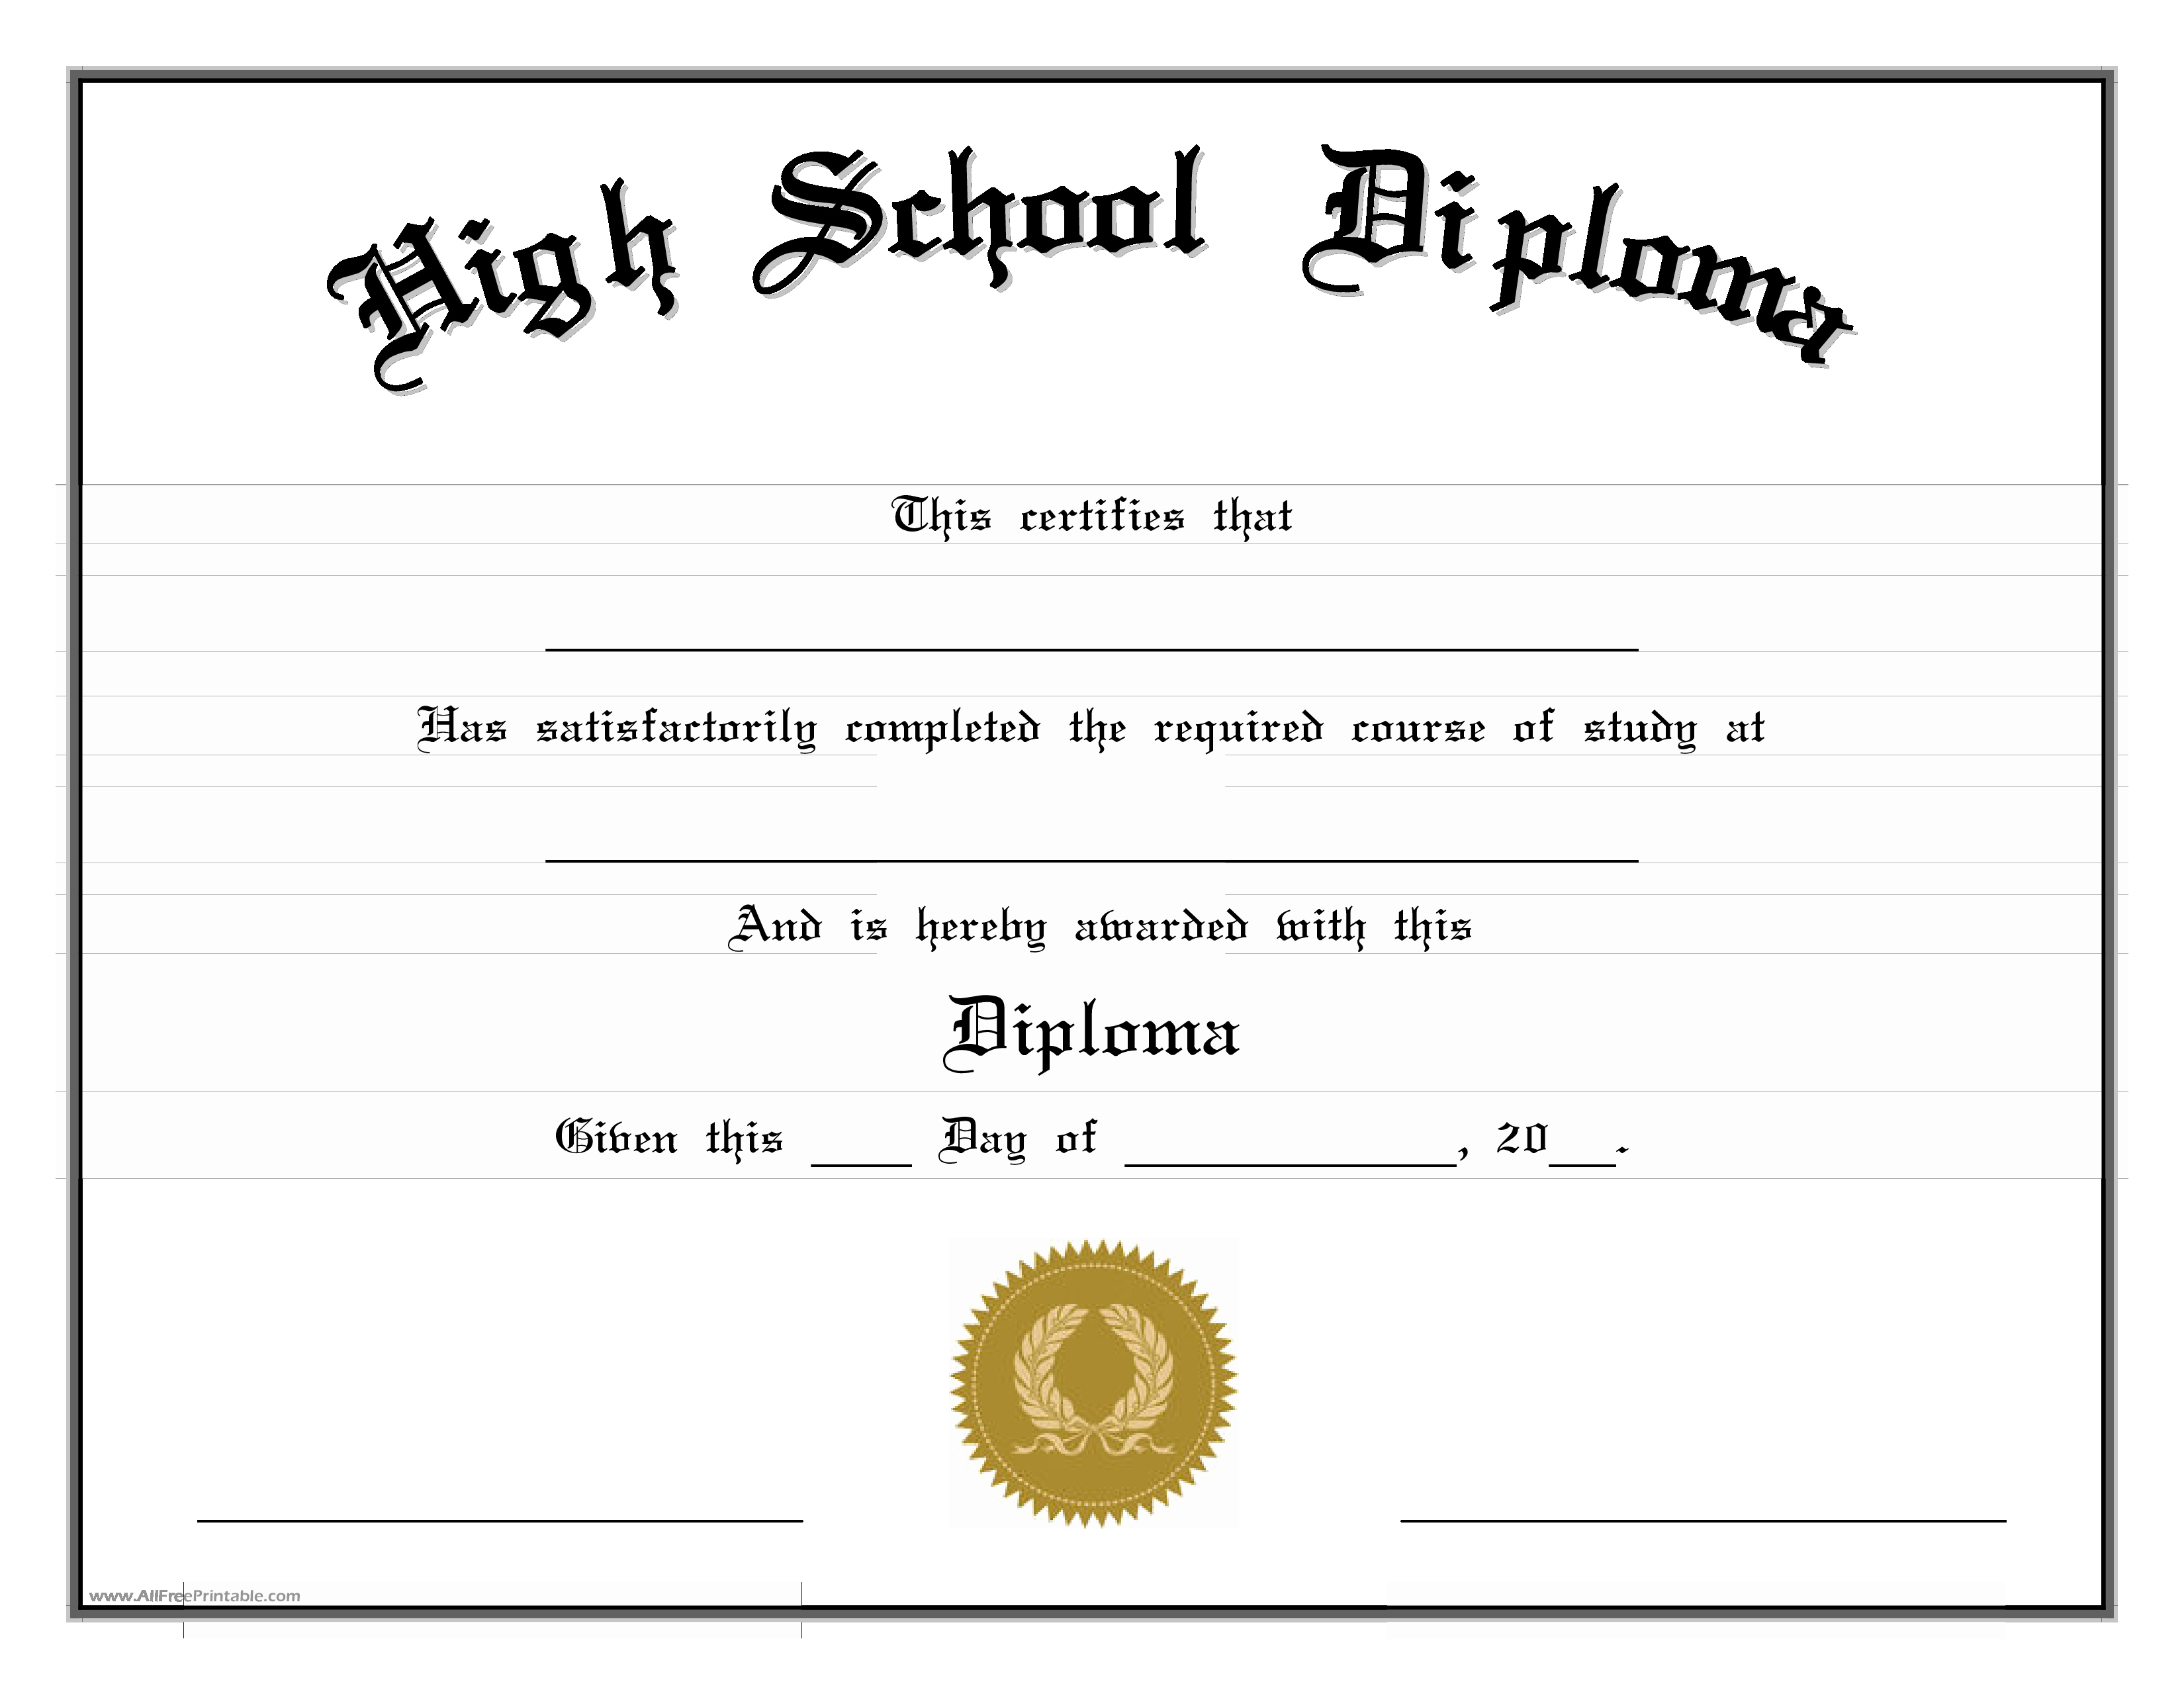 College Diploma Template Pdf Fresh High School Diploma Edit Cert Highs 2 Pdf Easy to